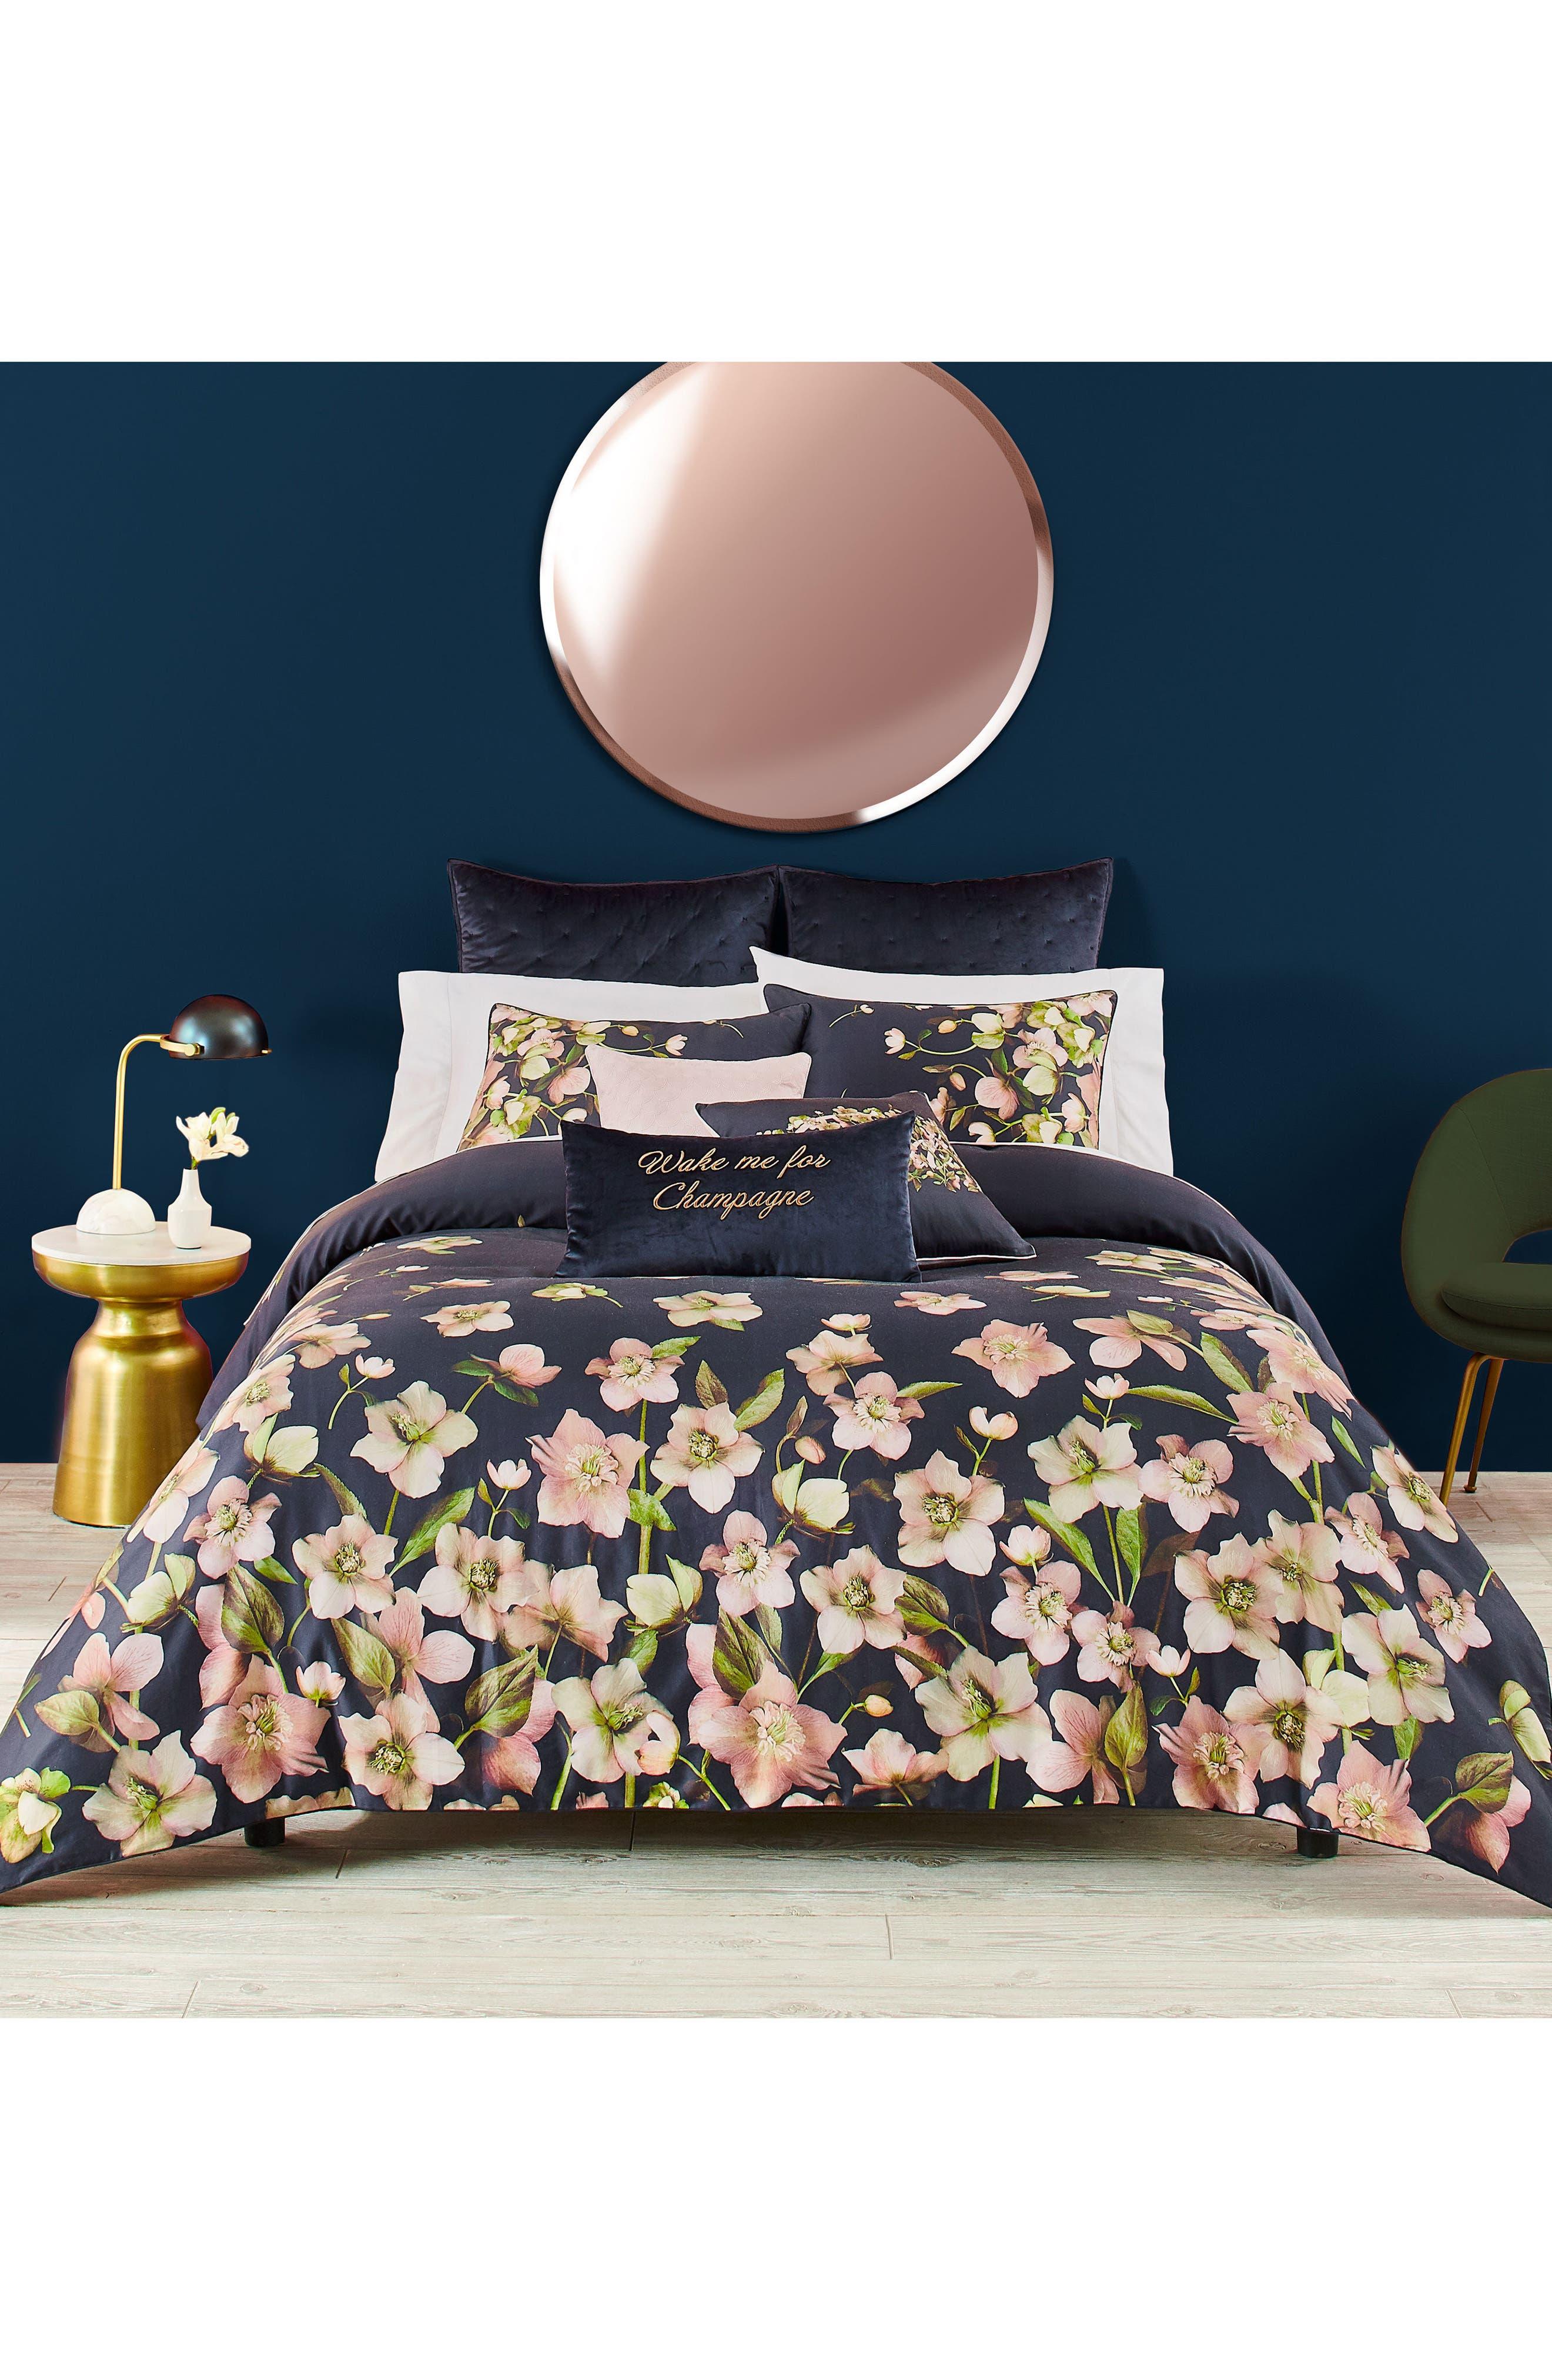 TED BAKER LONDON, Arboretum Comforter & Sham Set, Main thumbnail 1, color, NAVY